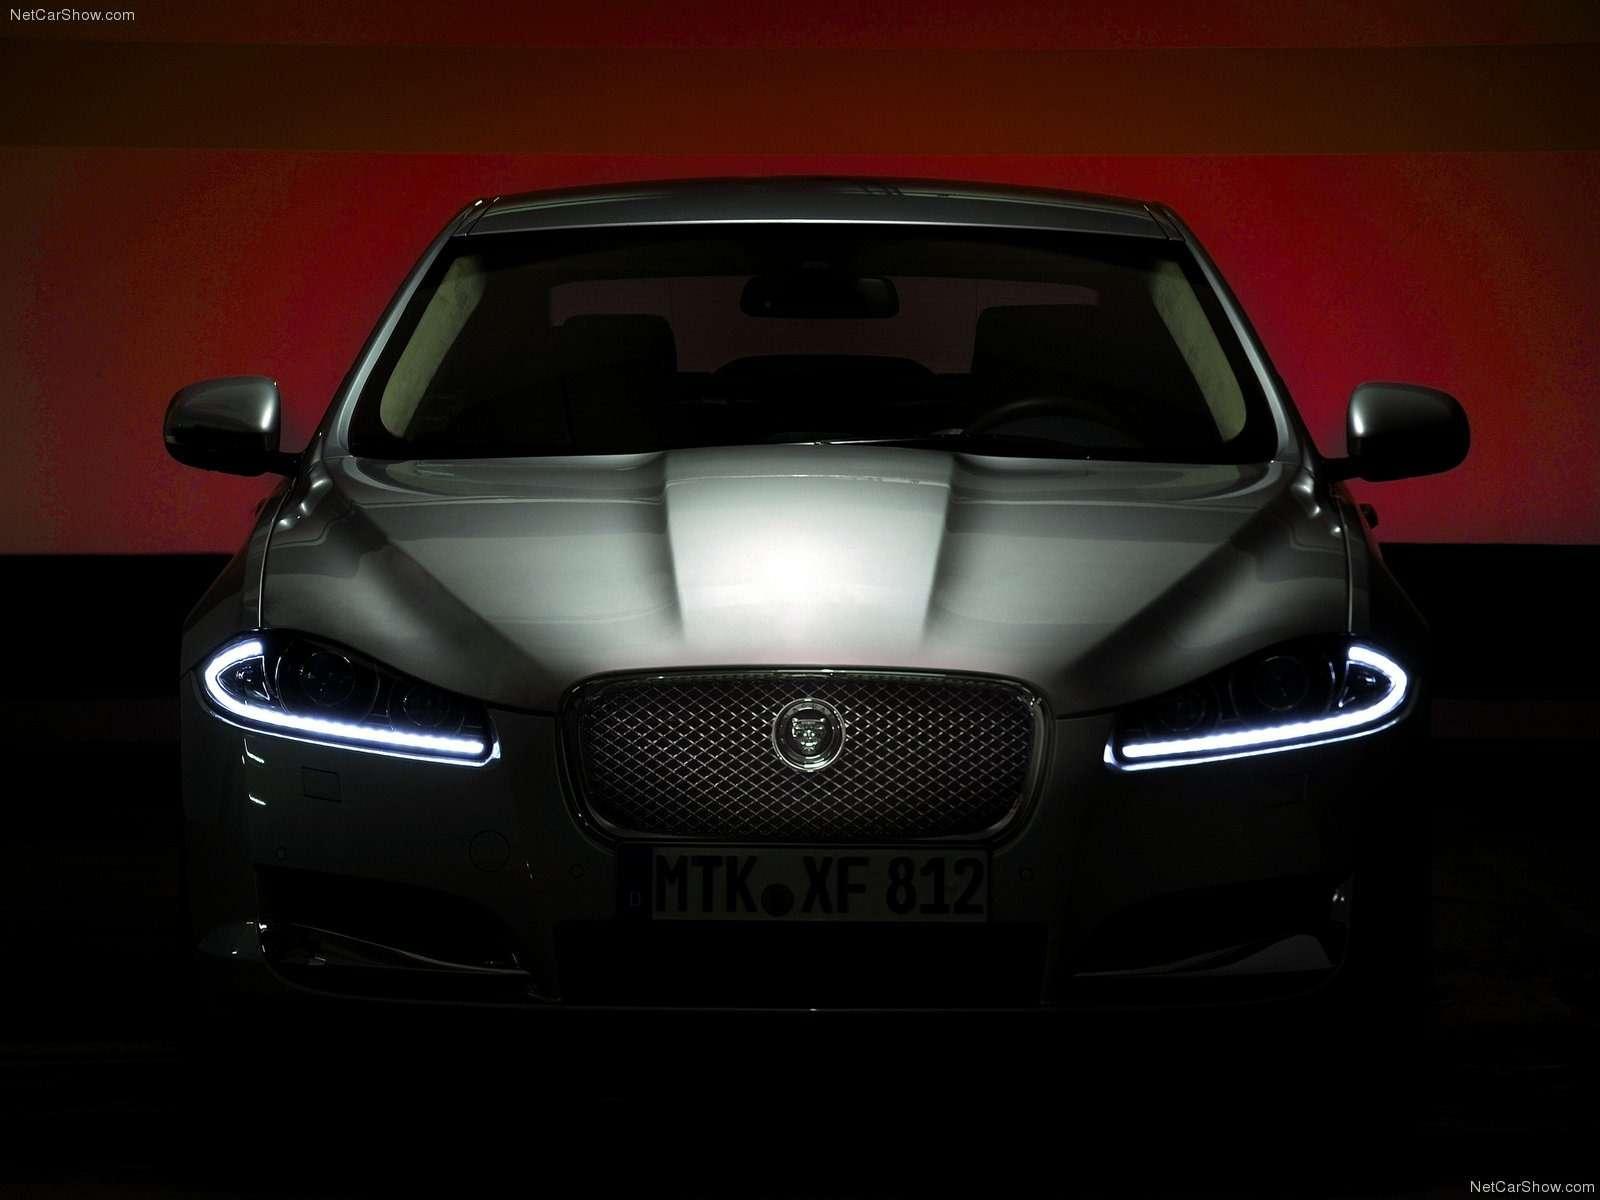 Jaguar-XF_2012_1600x1200_wallpaper_2b